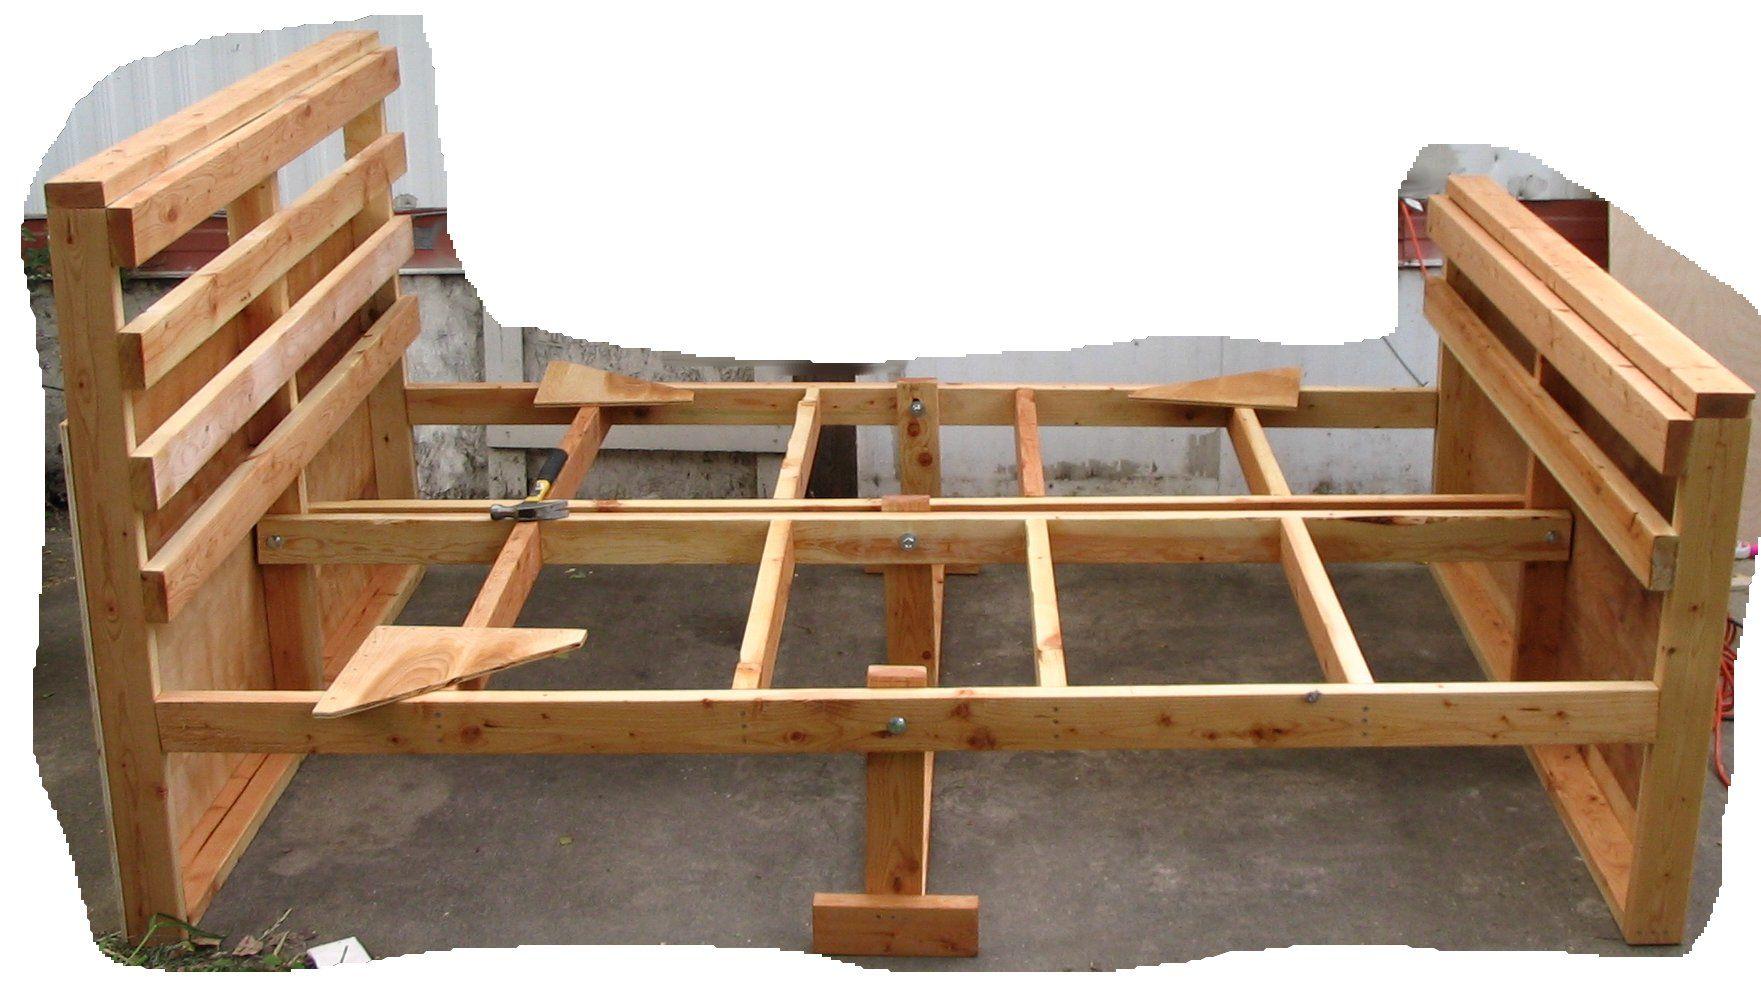 Woodworking plans Bed Frame Plans Free free download Bed frame plans ...